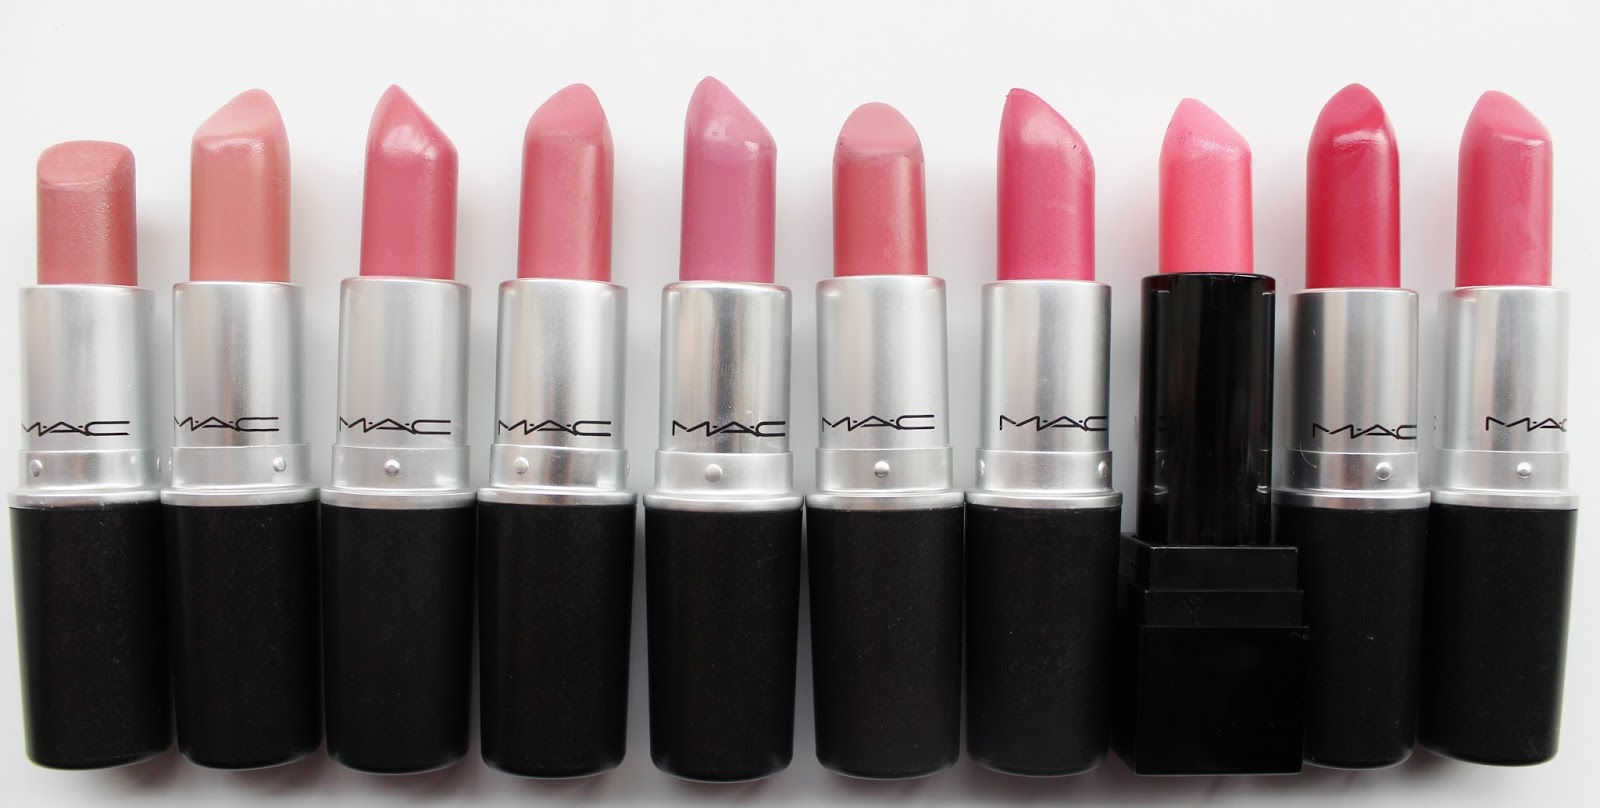 MAC Please Me Lipglass, Lipstick, Nail Lacquer Review ...  Mac Pink Plaid Vs Please Me